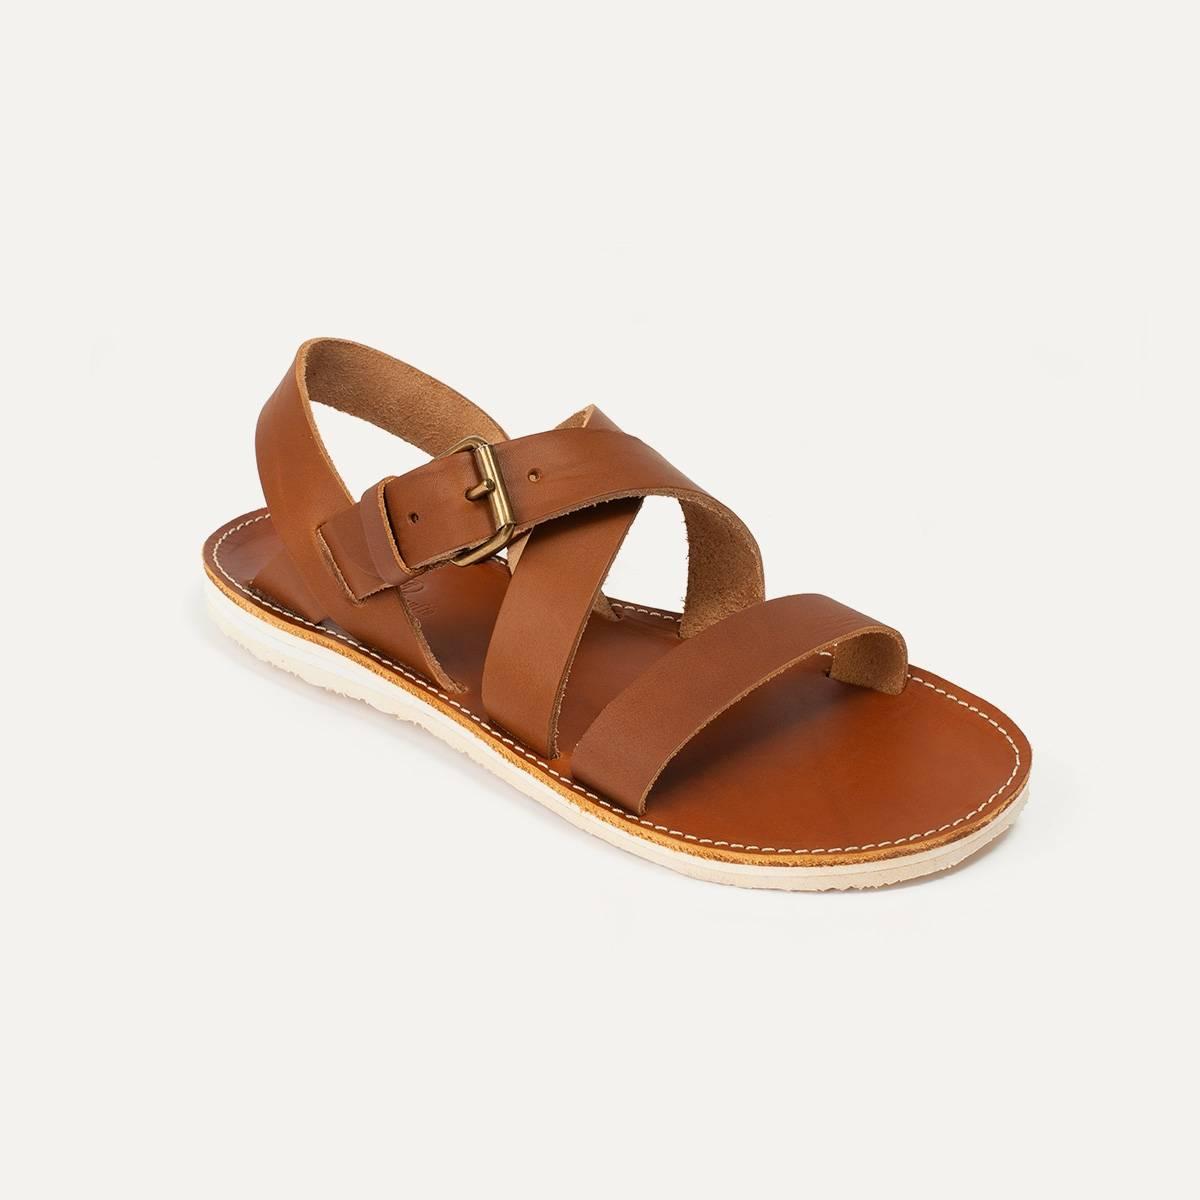 Iwate leather sandals - Pain Brûlé (image n°3)